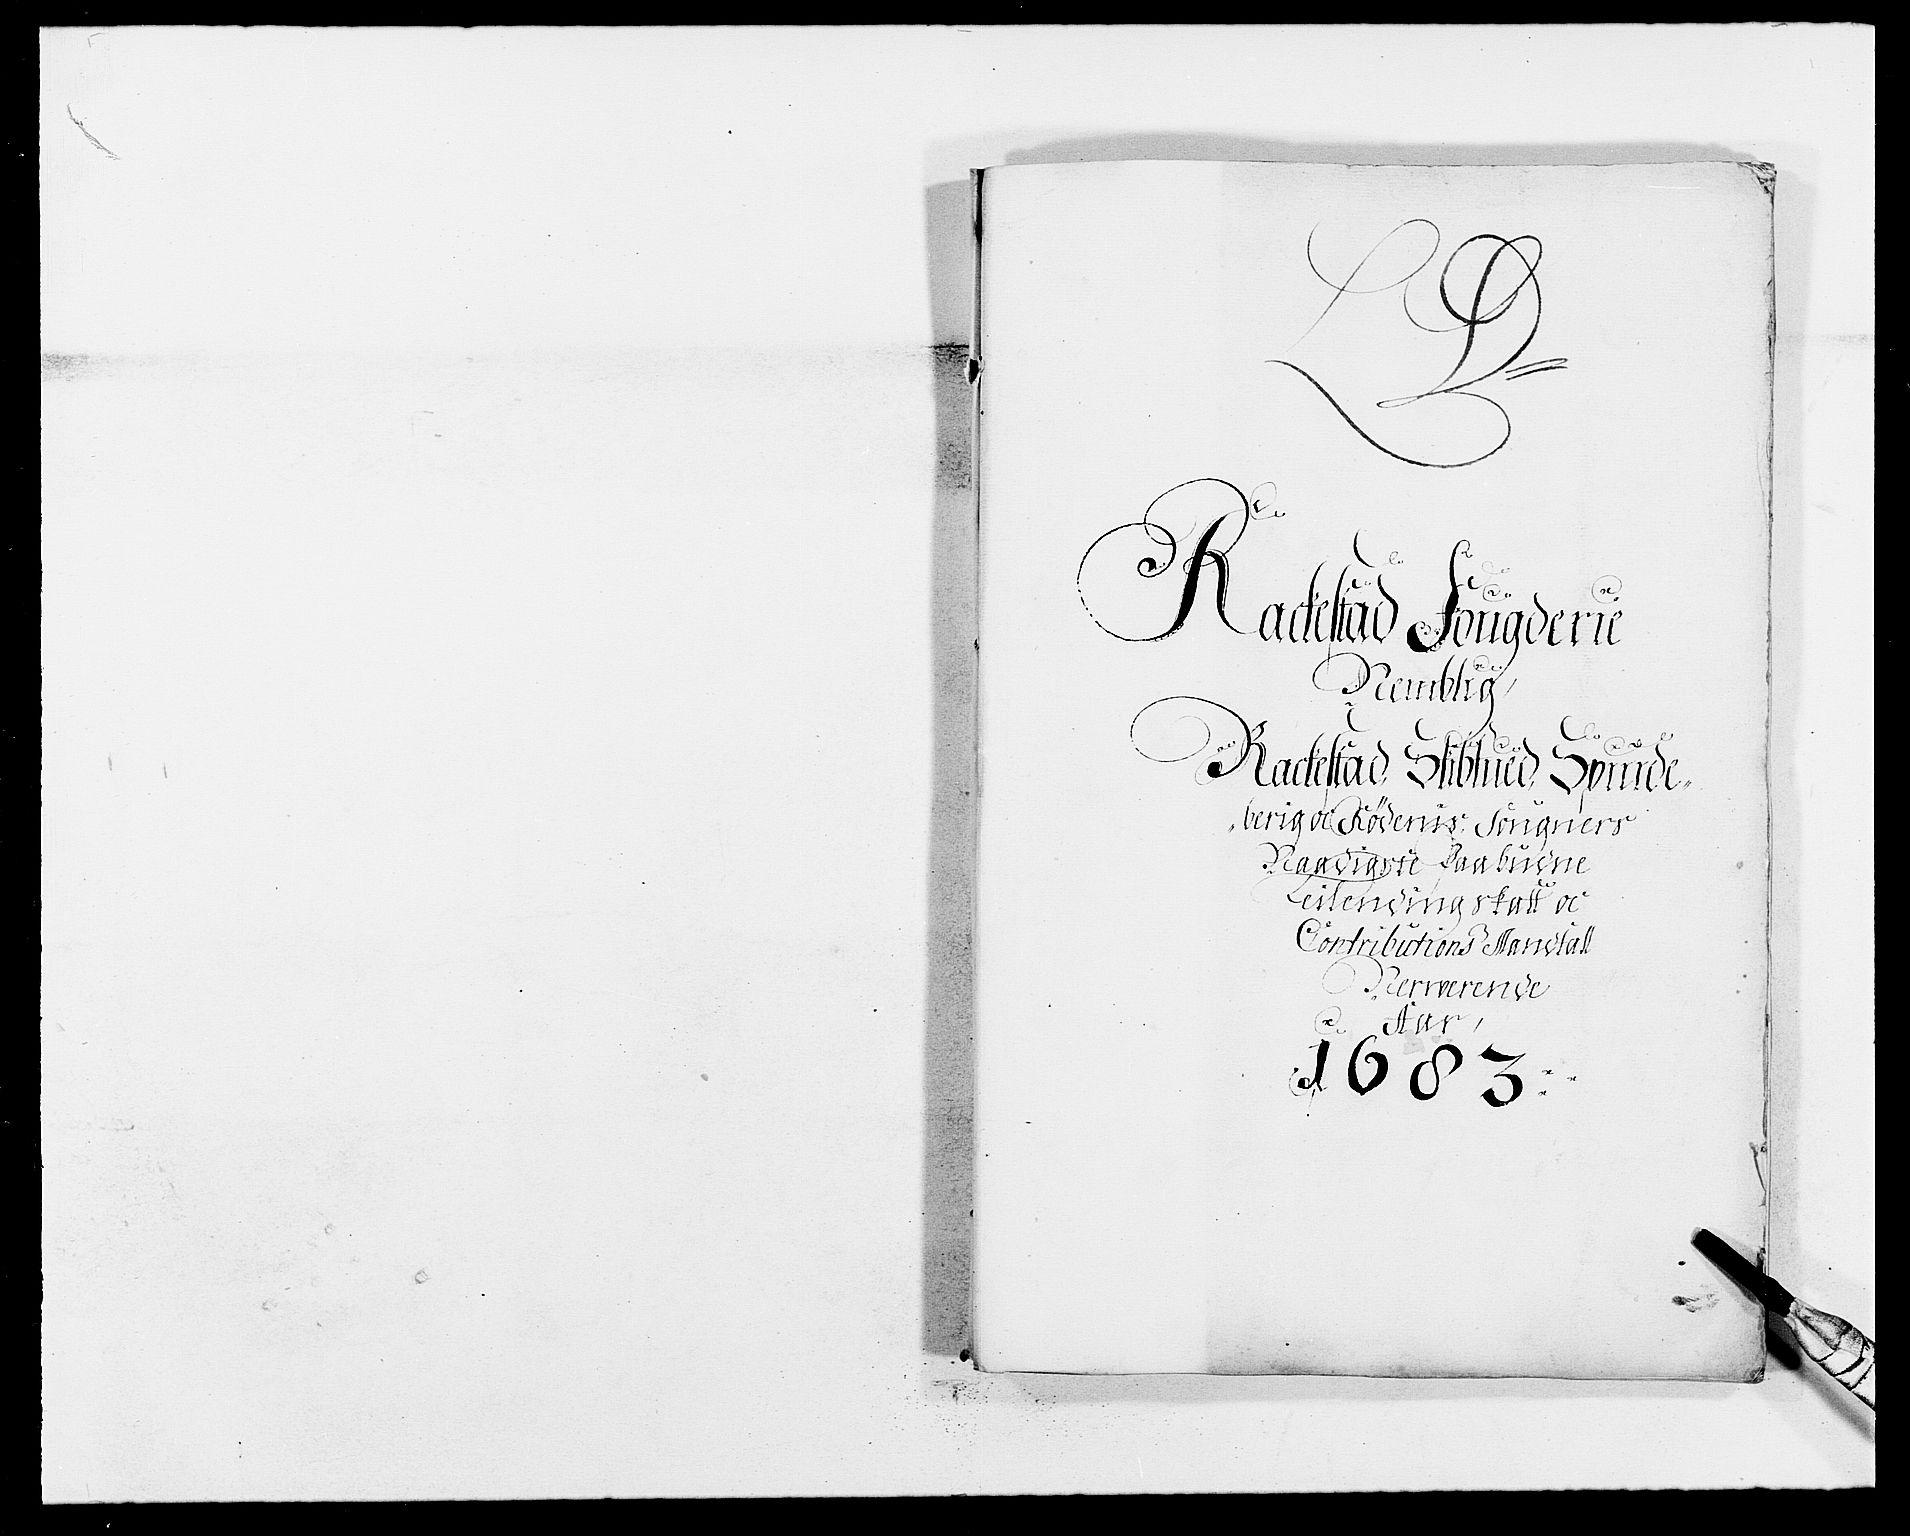 RA, Rentekammeret inntil 1814, Reviderte regnskaper, Fogderegnskap, R05/L0274: Fogderegnskap Rakkestad, 1683-1684, s. 46